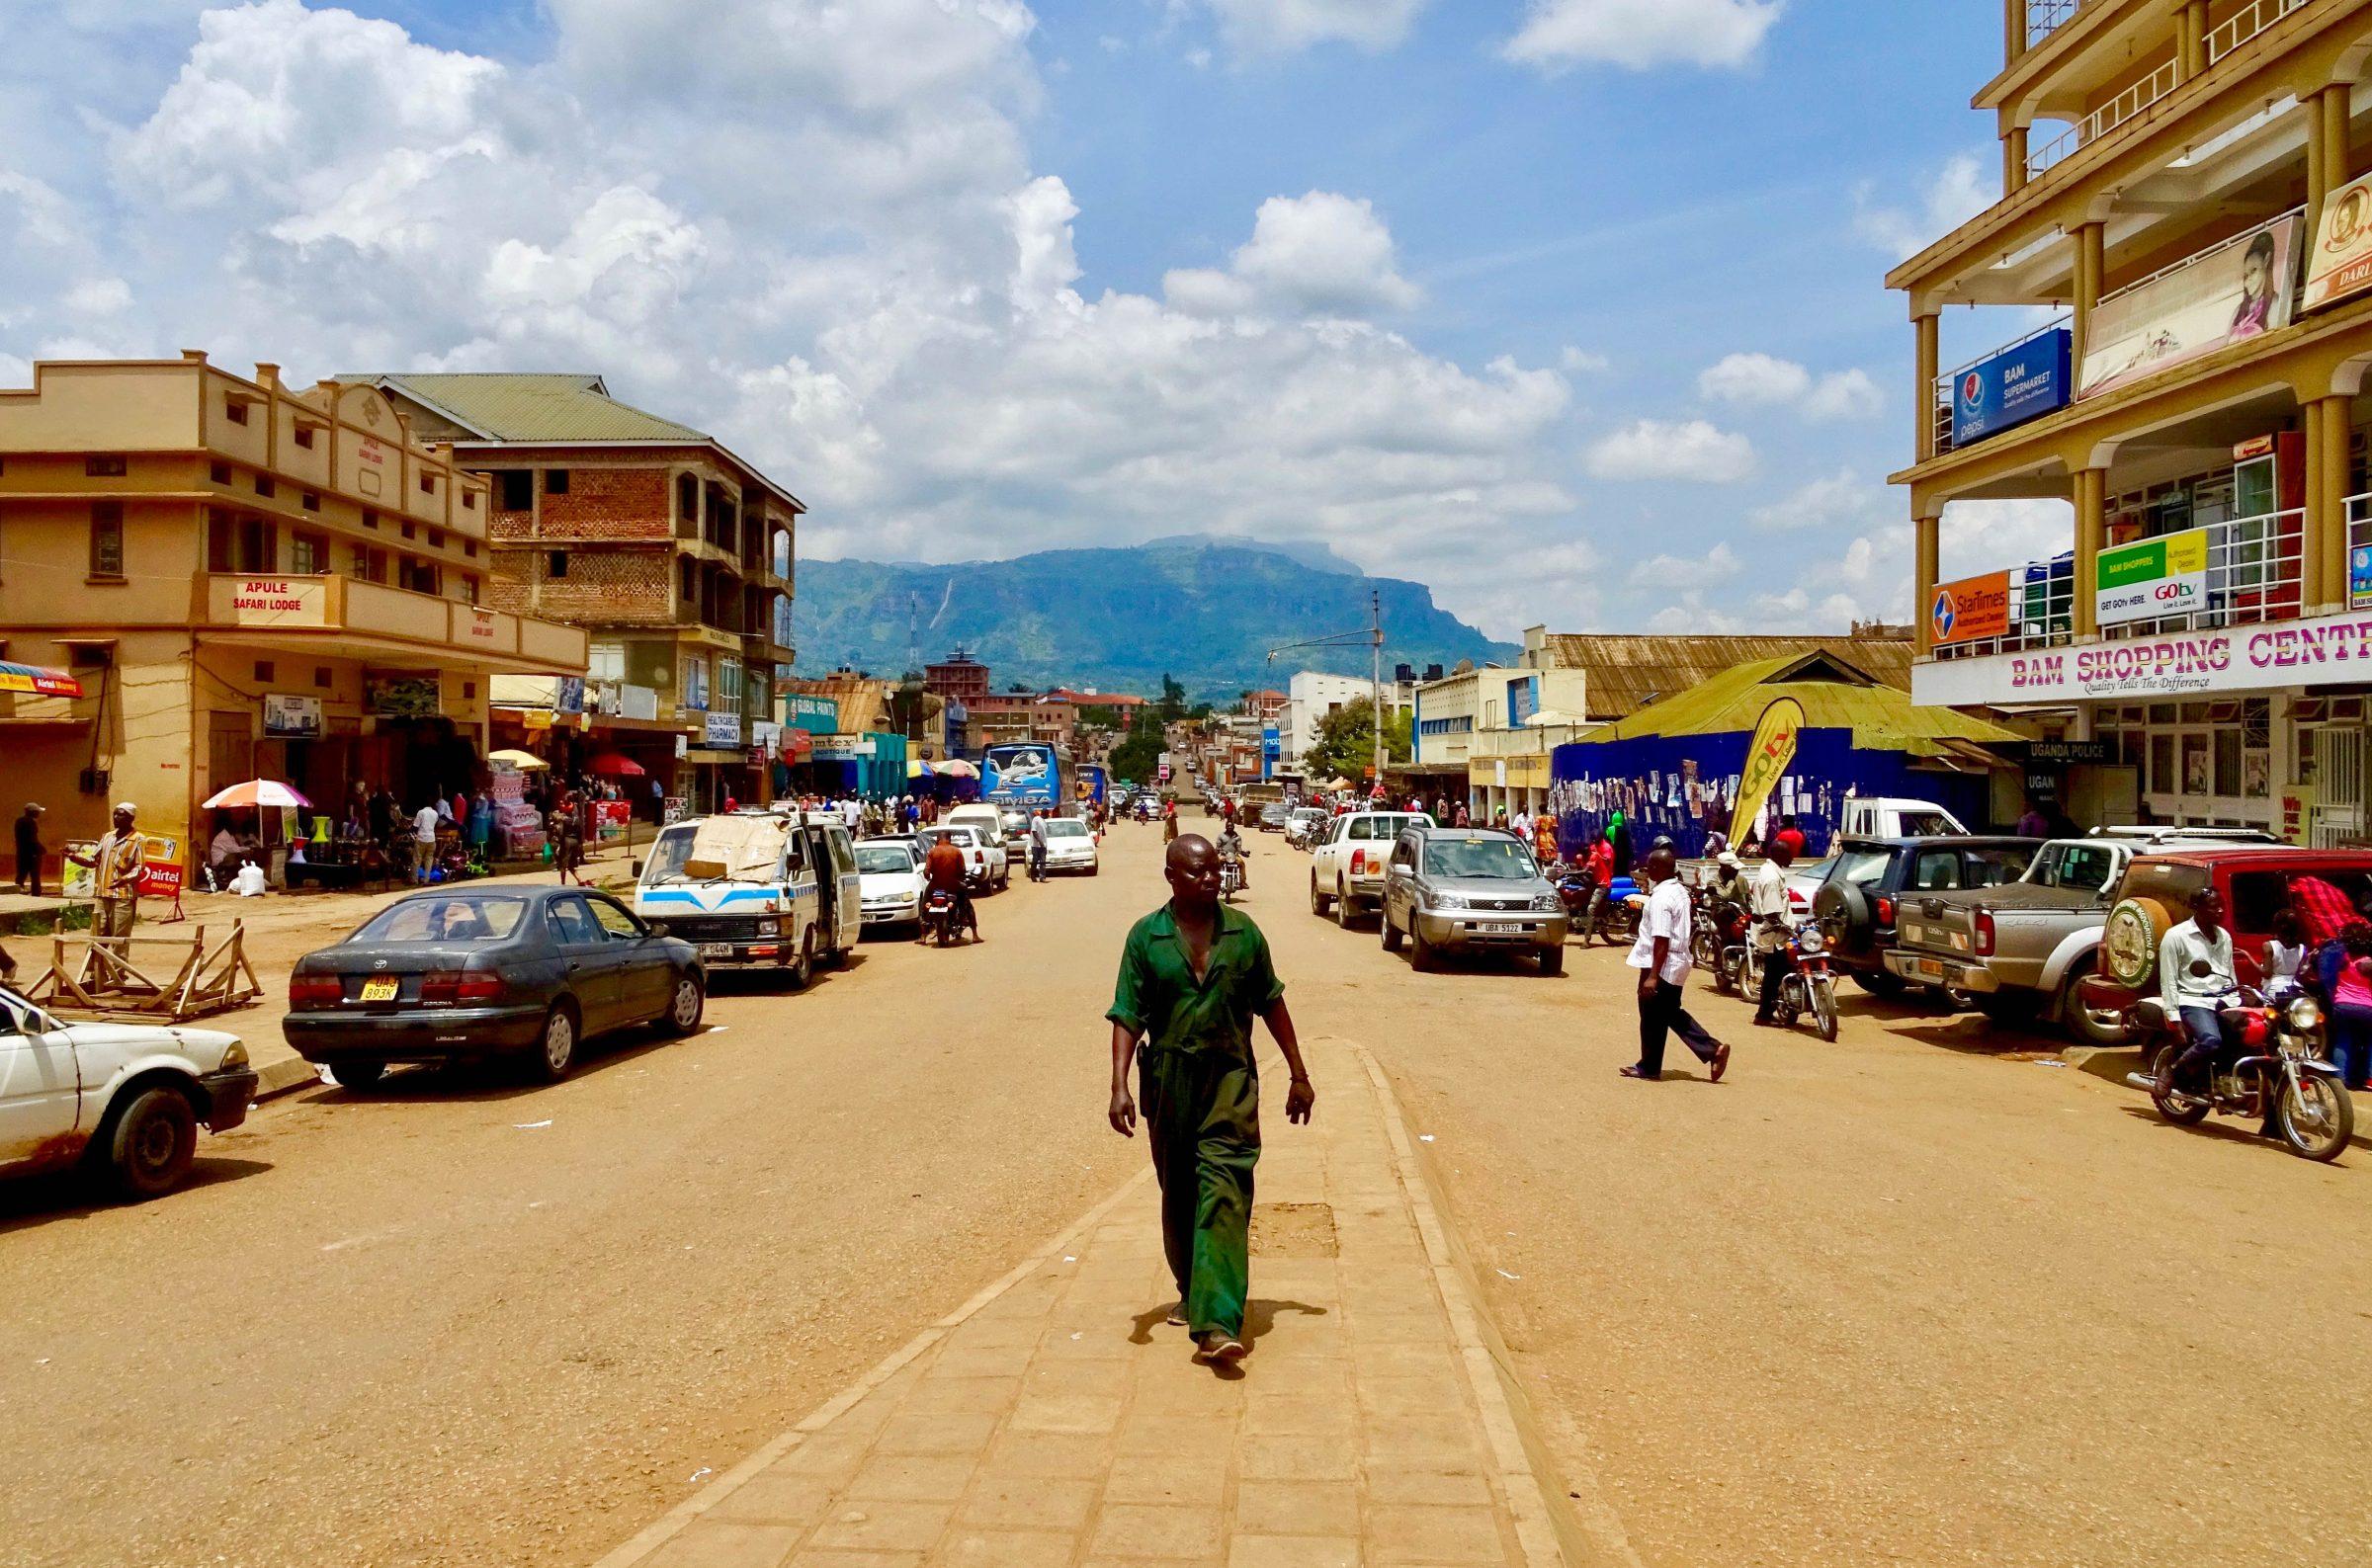 Het centrum van Mbale in Oeganda